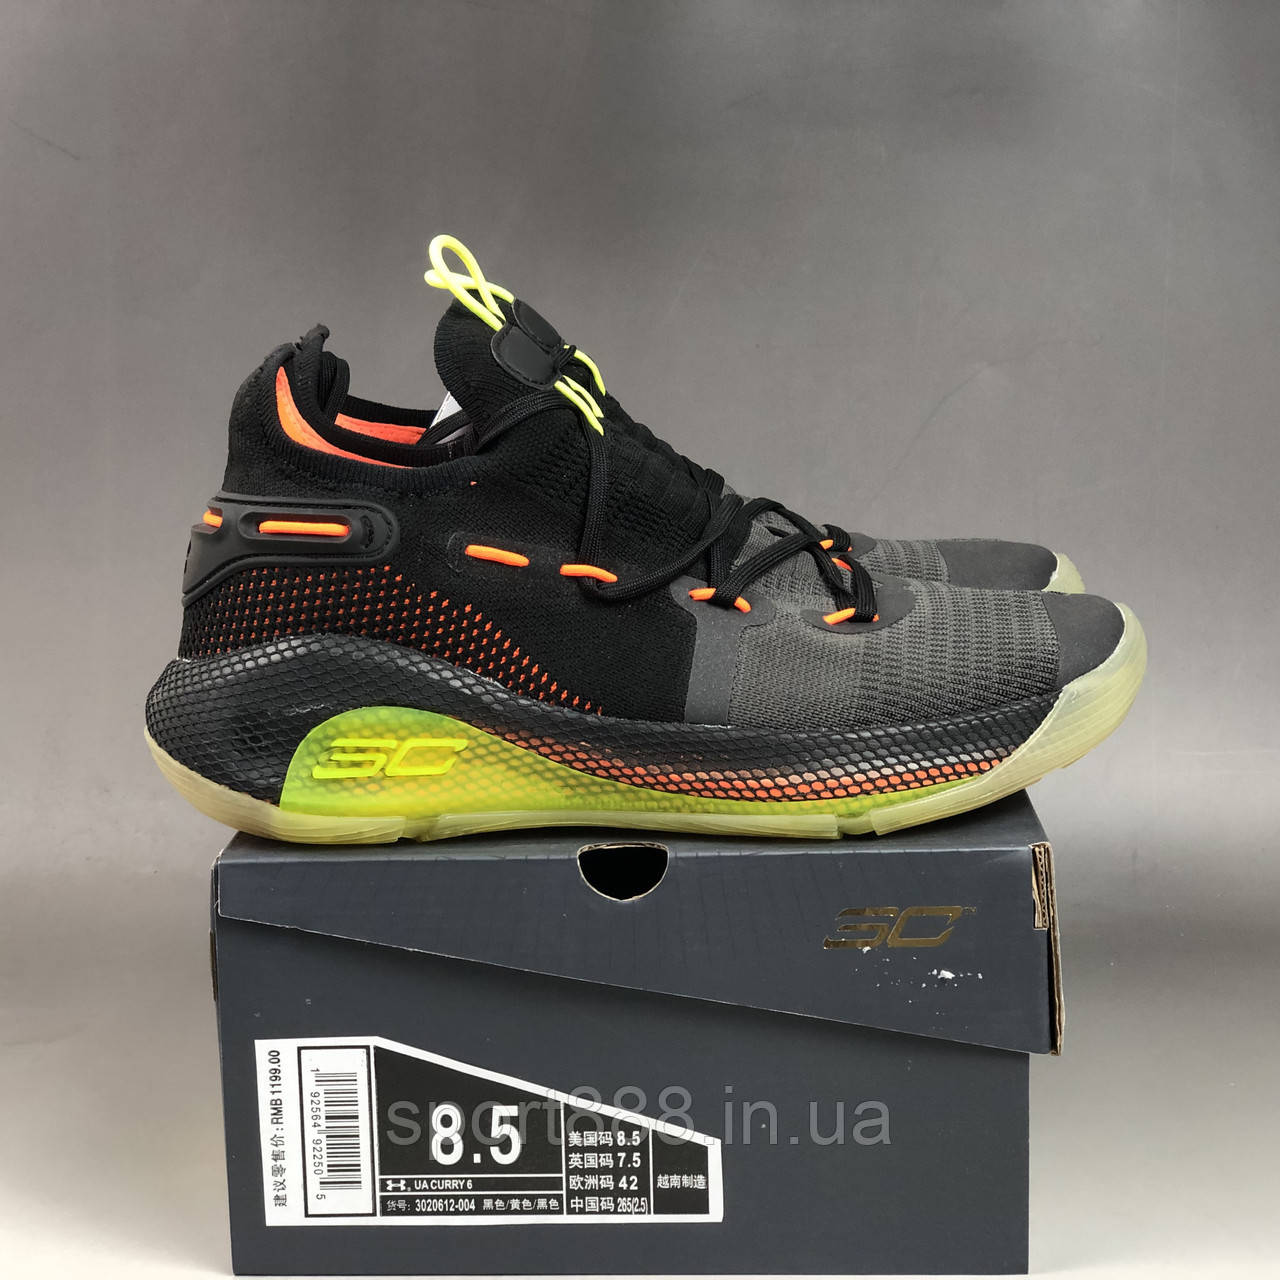 new product d050f 09ceb Under Armour Curry 6 Low Fox Theater мужские кроссовки: продажа, цена в  Николаеве. обувь для баскетбола от